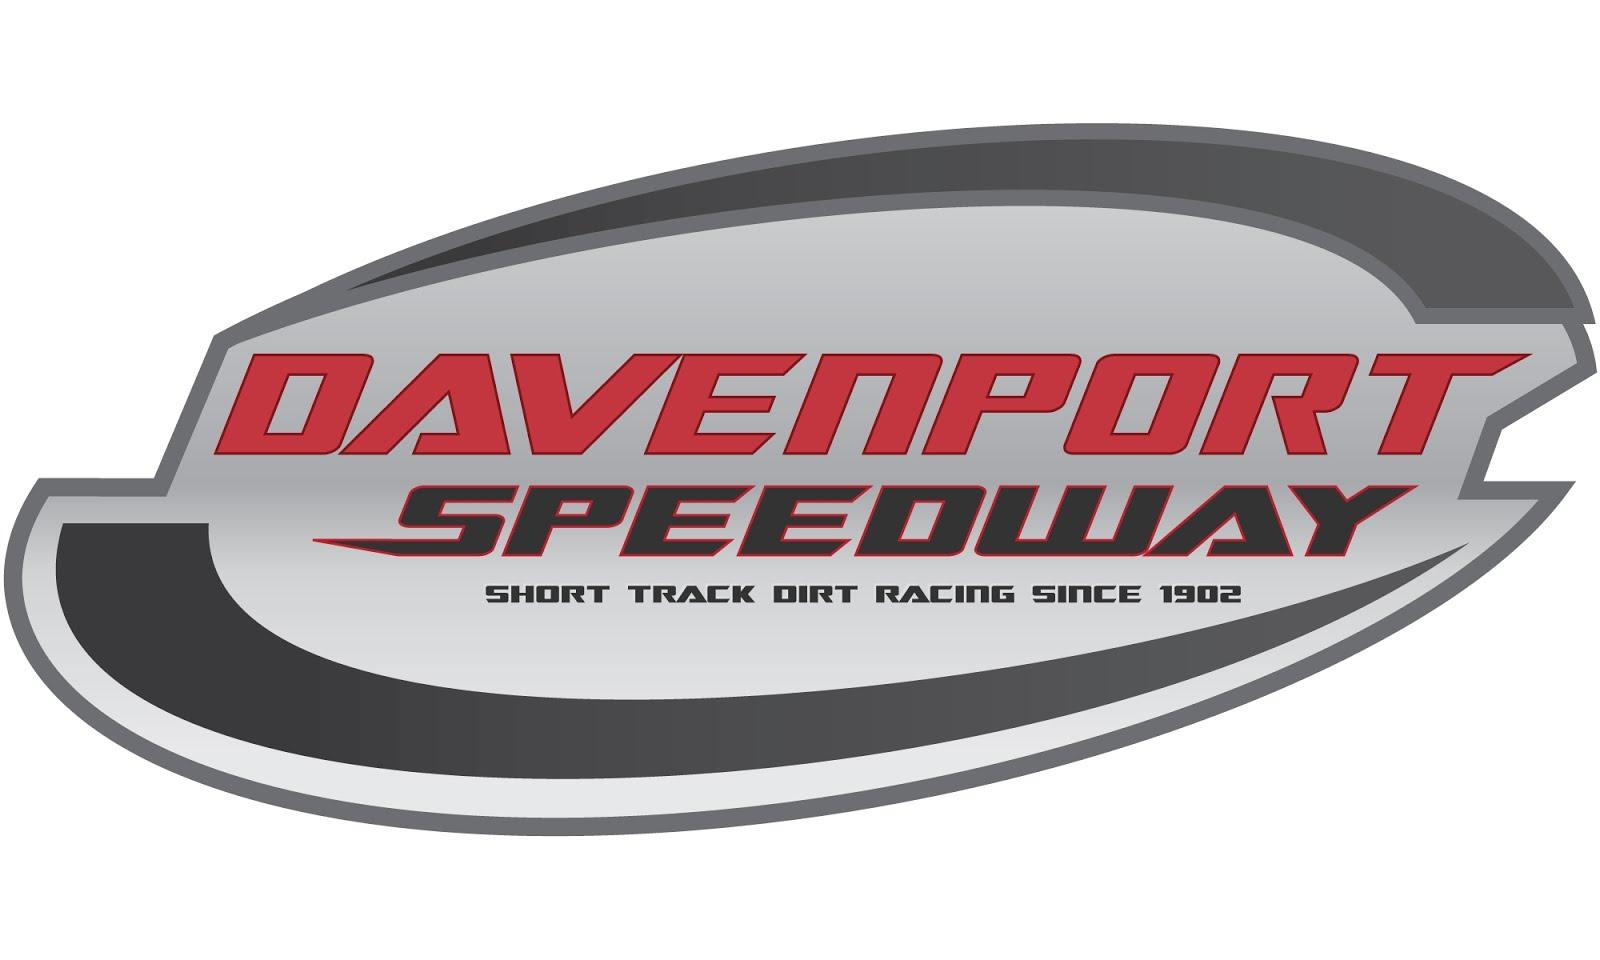 Davenport Speedway